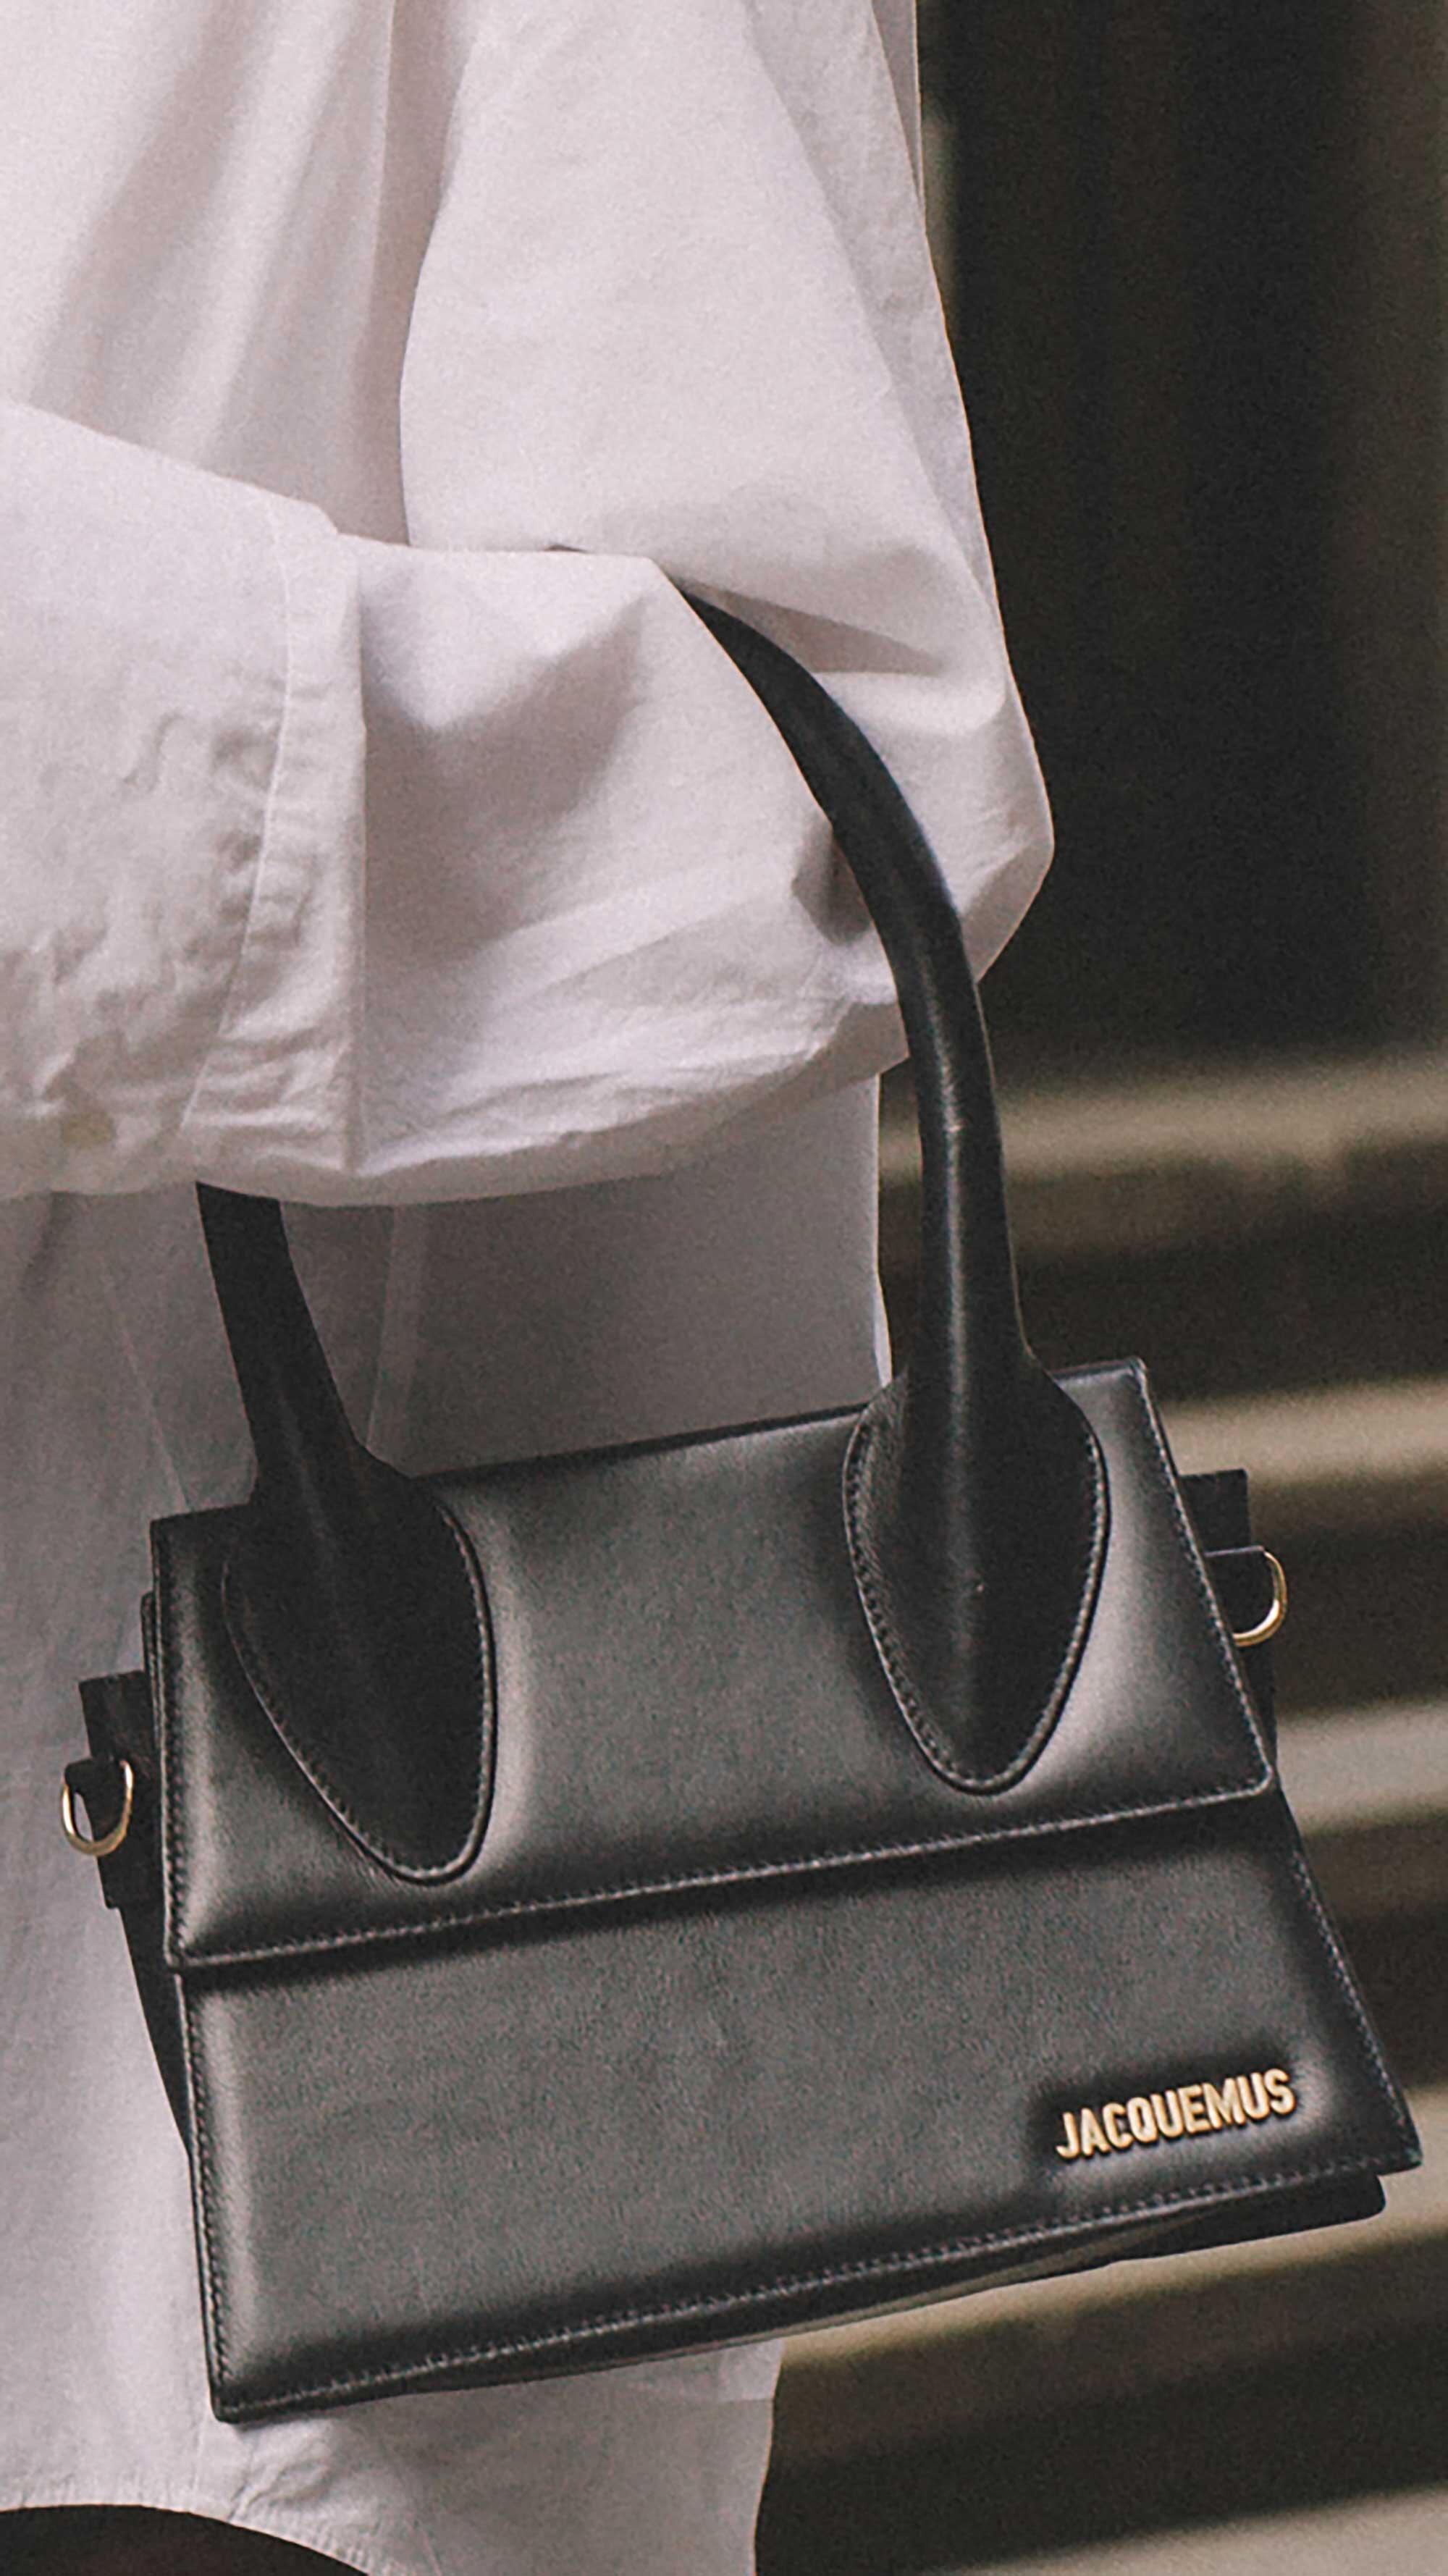 8. Jacquemus - Black Le Chiquito bag